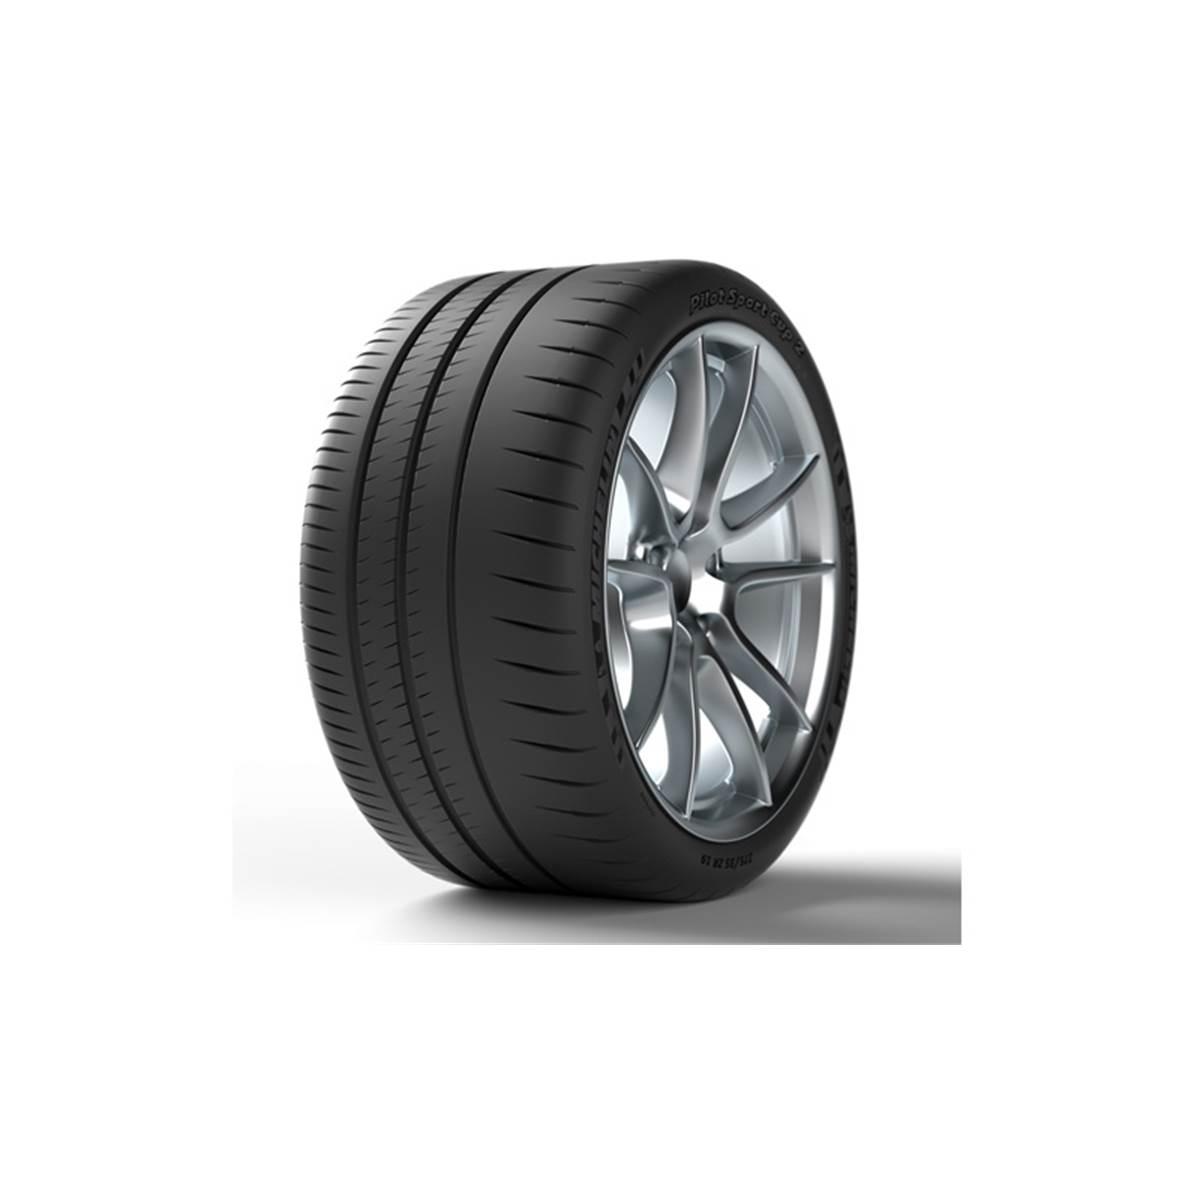 Pneu Michelin 245/35R20 91Y Pilot Sport Cup 2